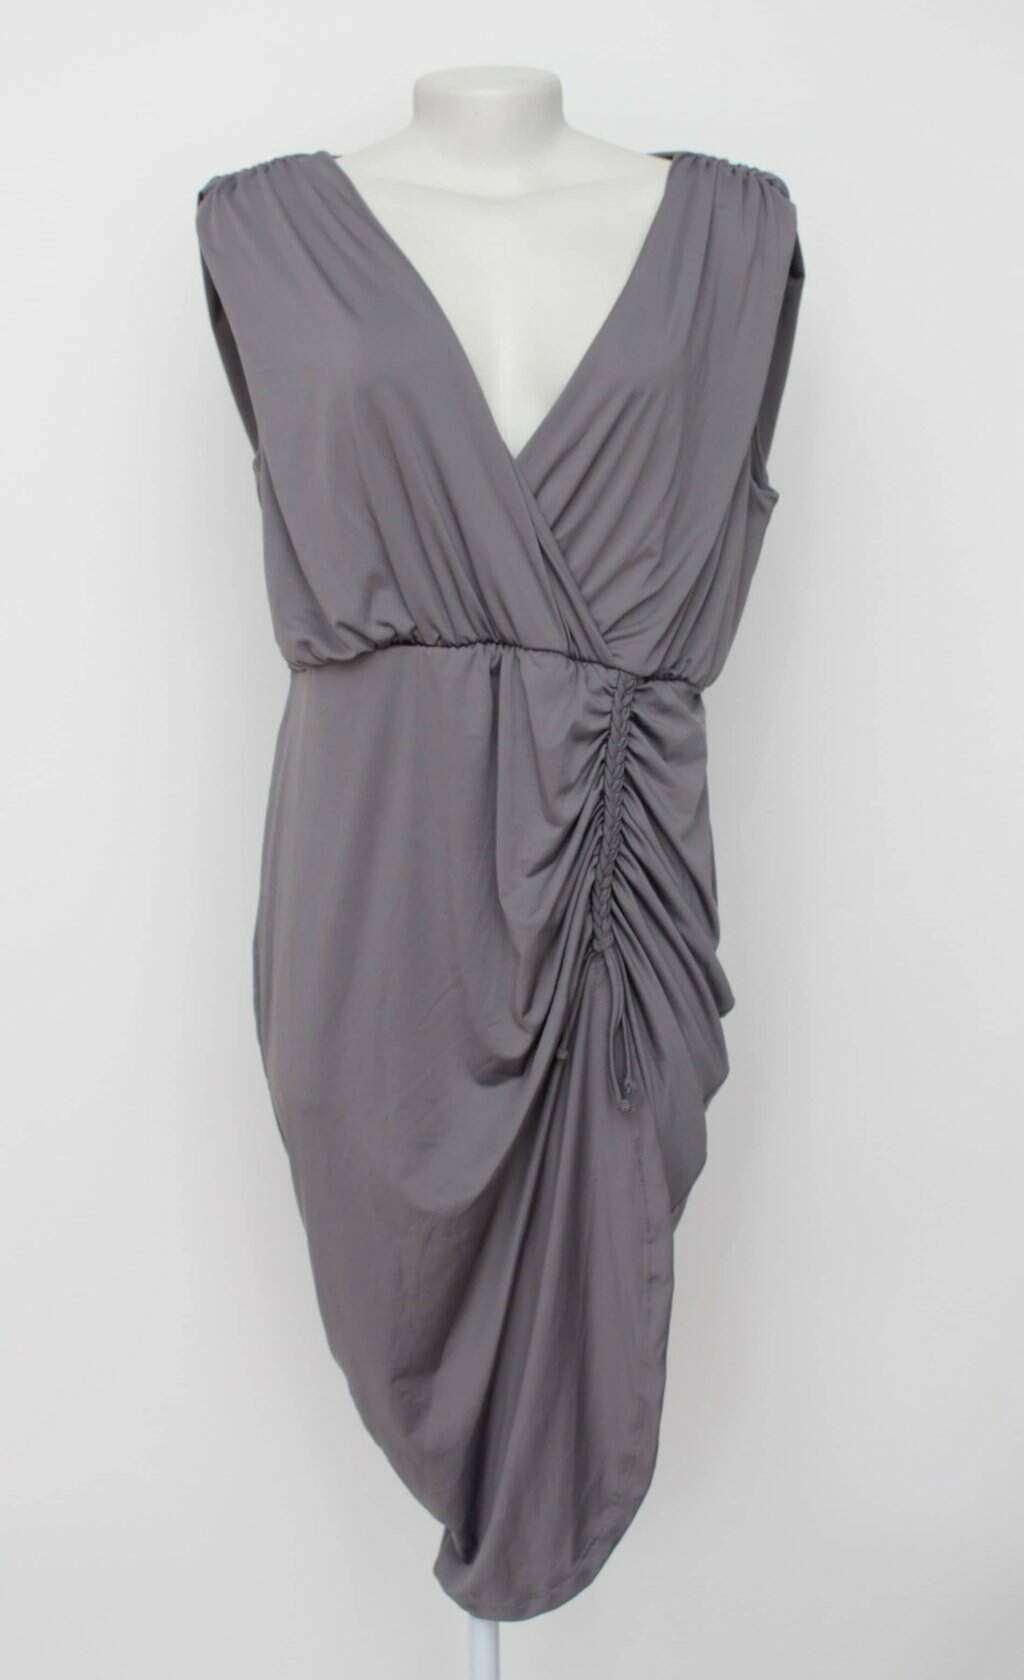 Vestido cinza drapeado bonprix